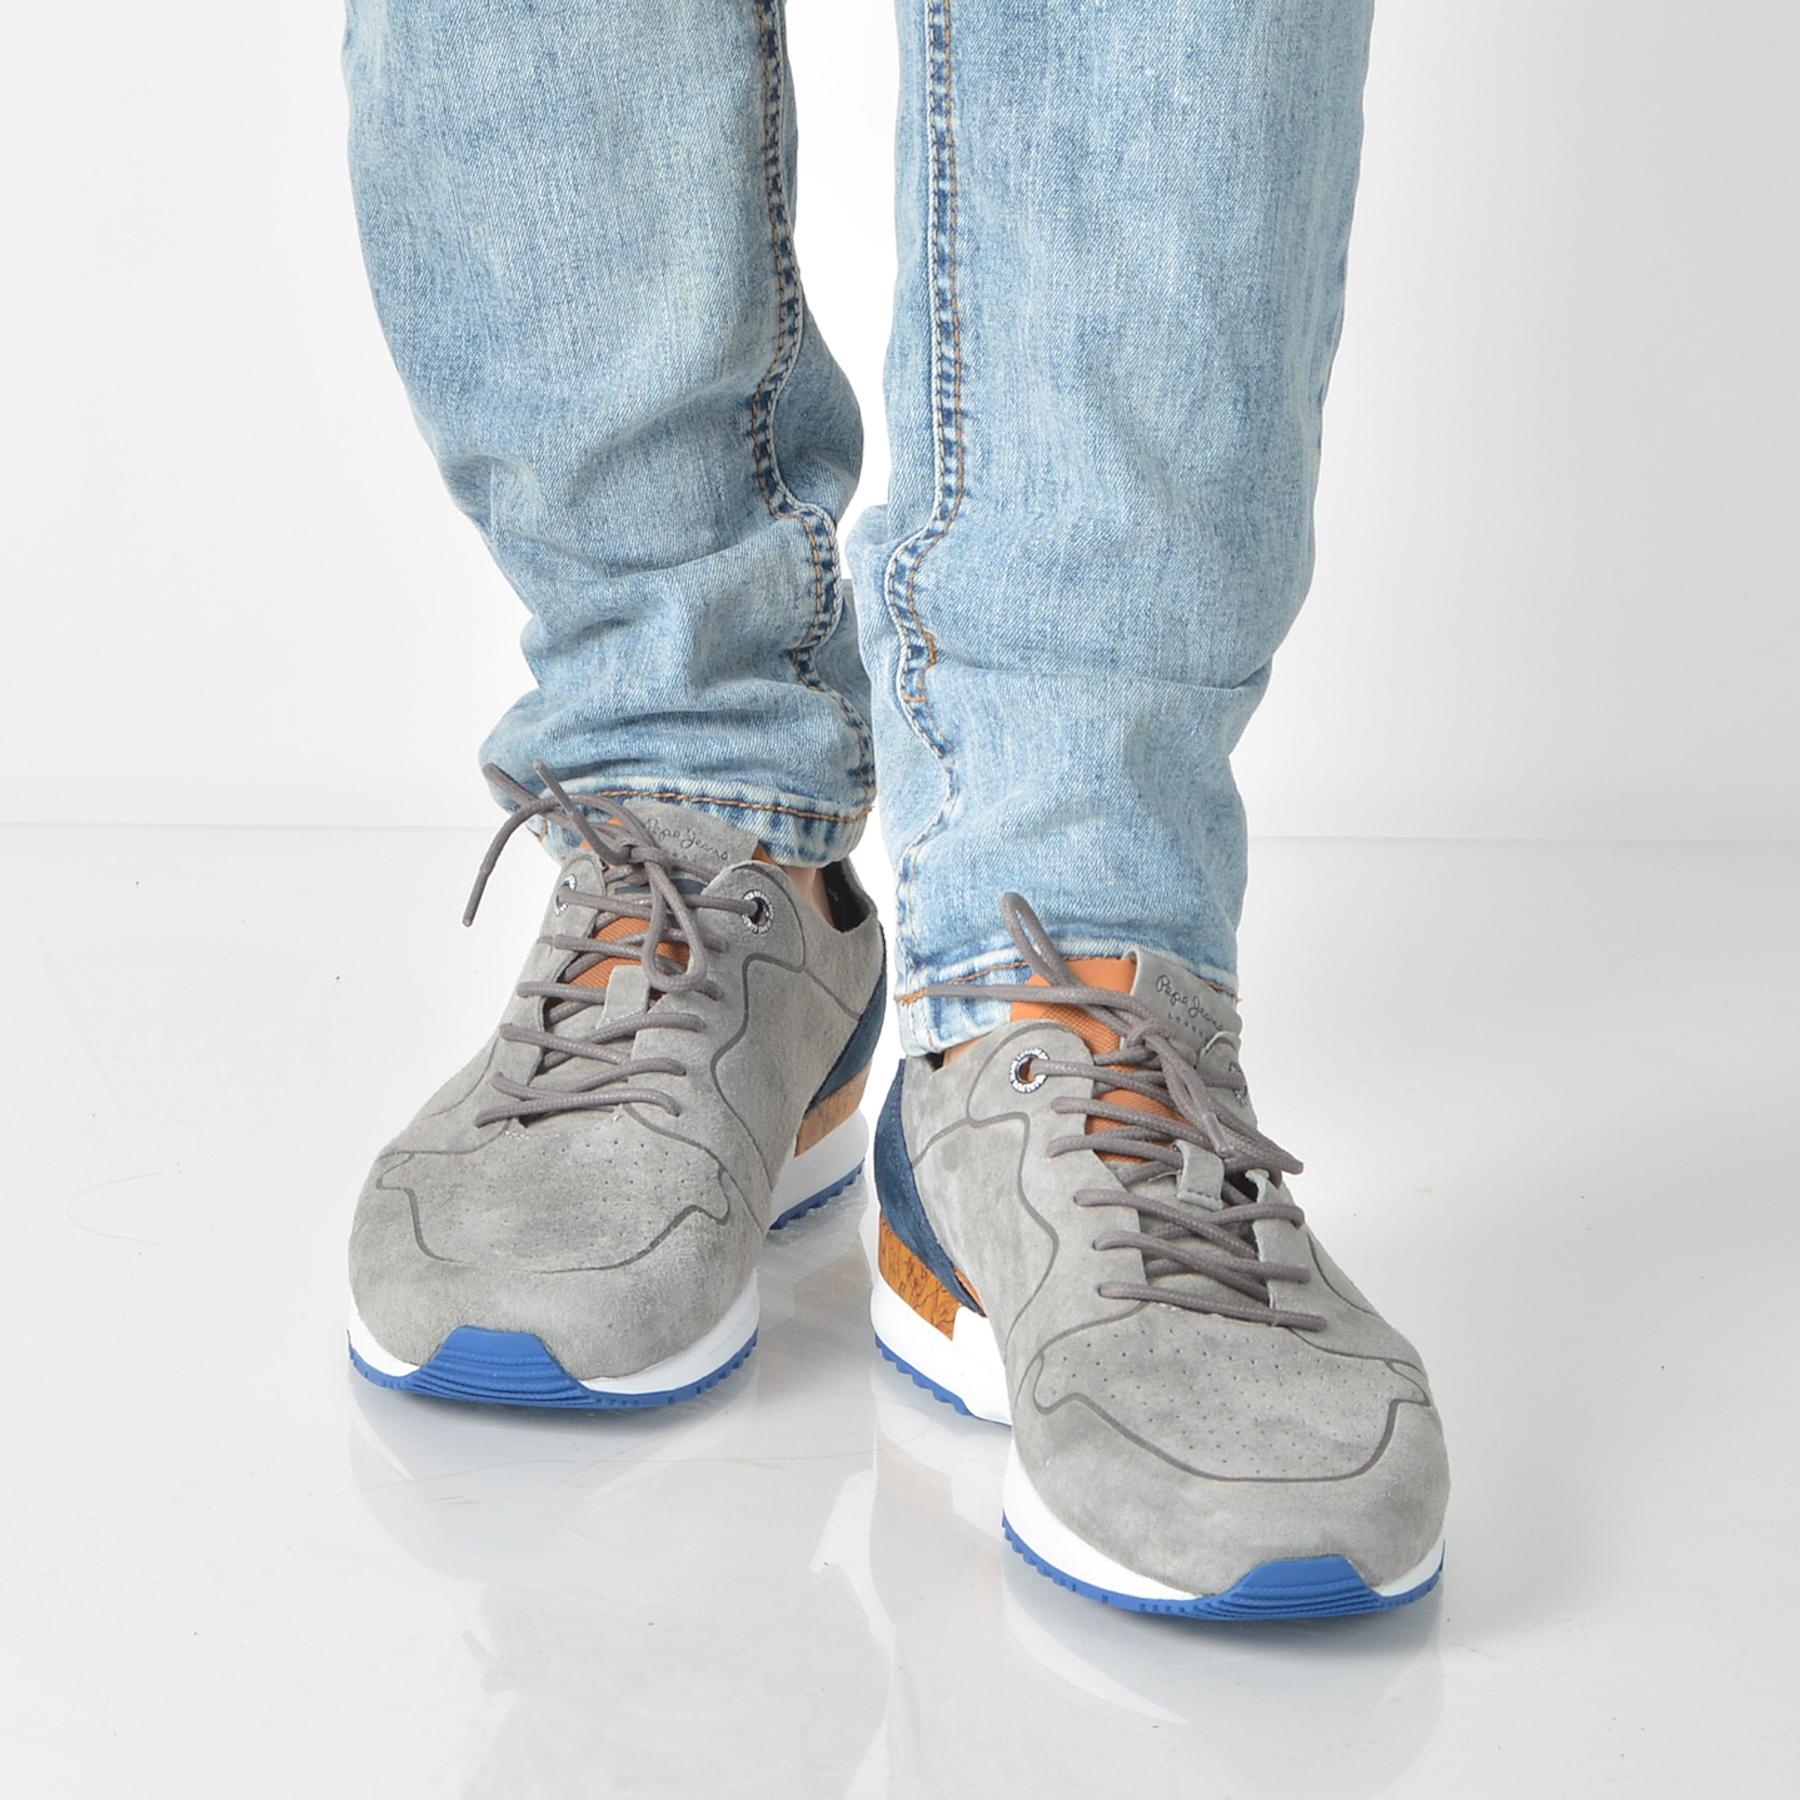 Pantofi Sport Pepe Jeans Gri, Ms30411, Din Piele Naturala